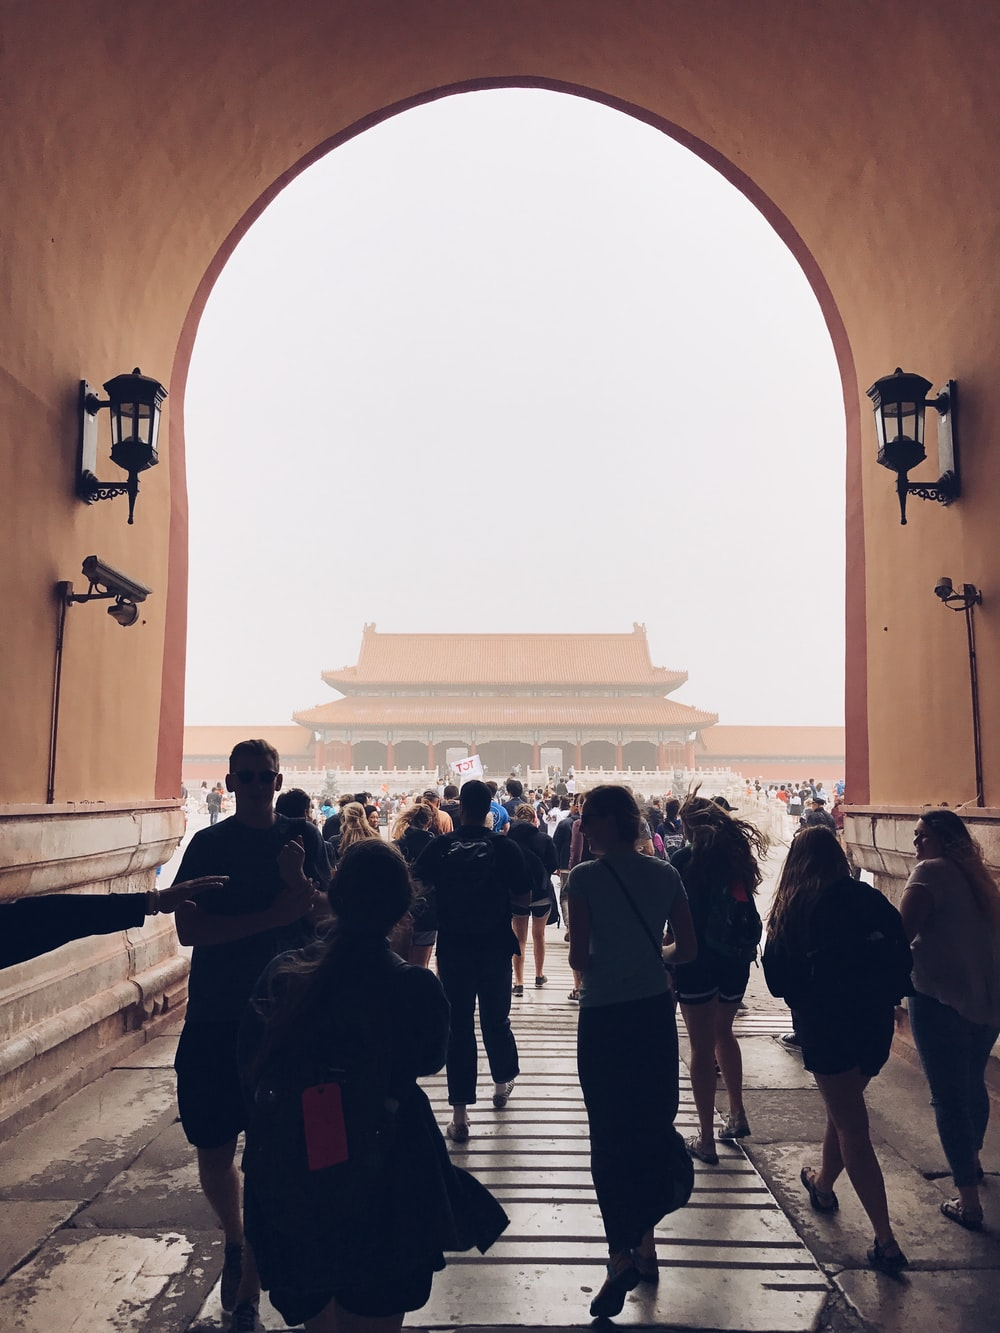 people walking near temple during daytime